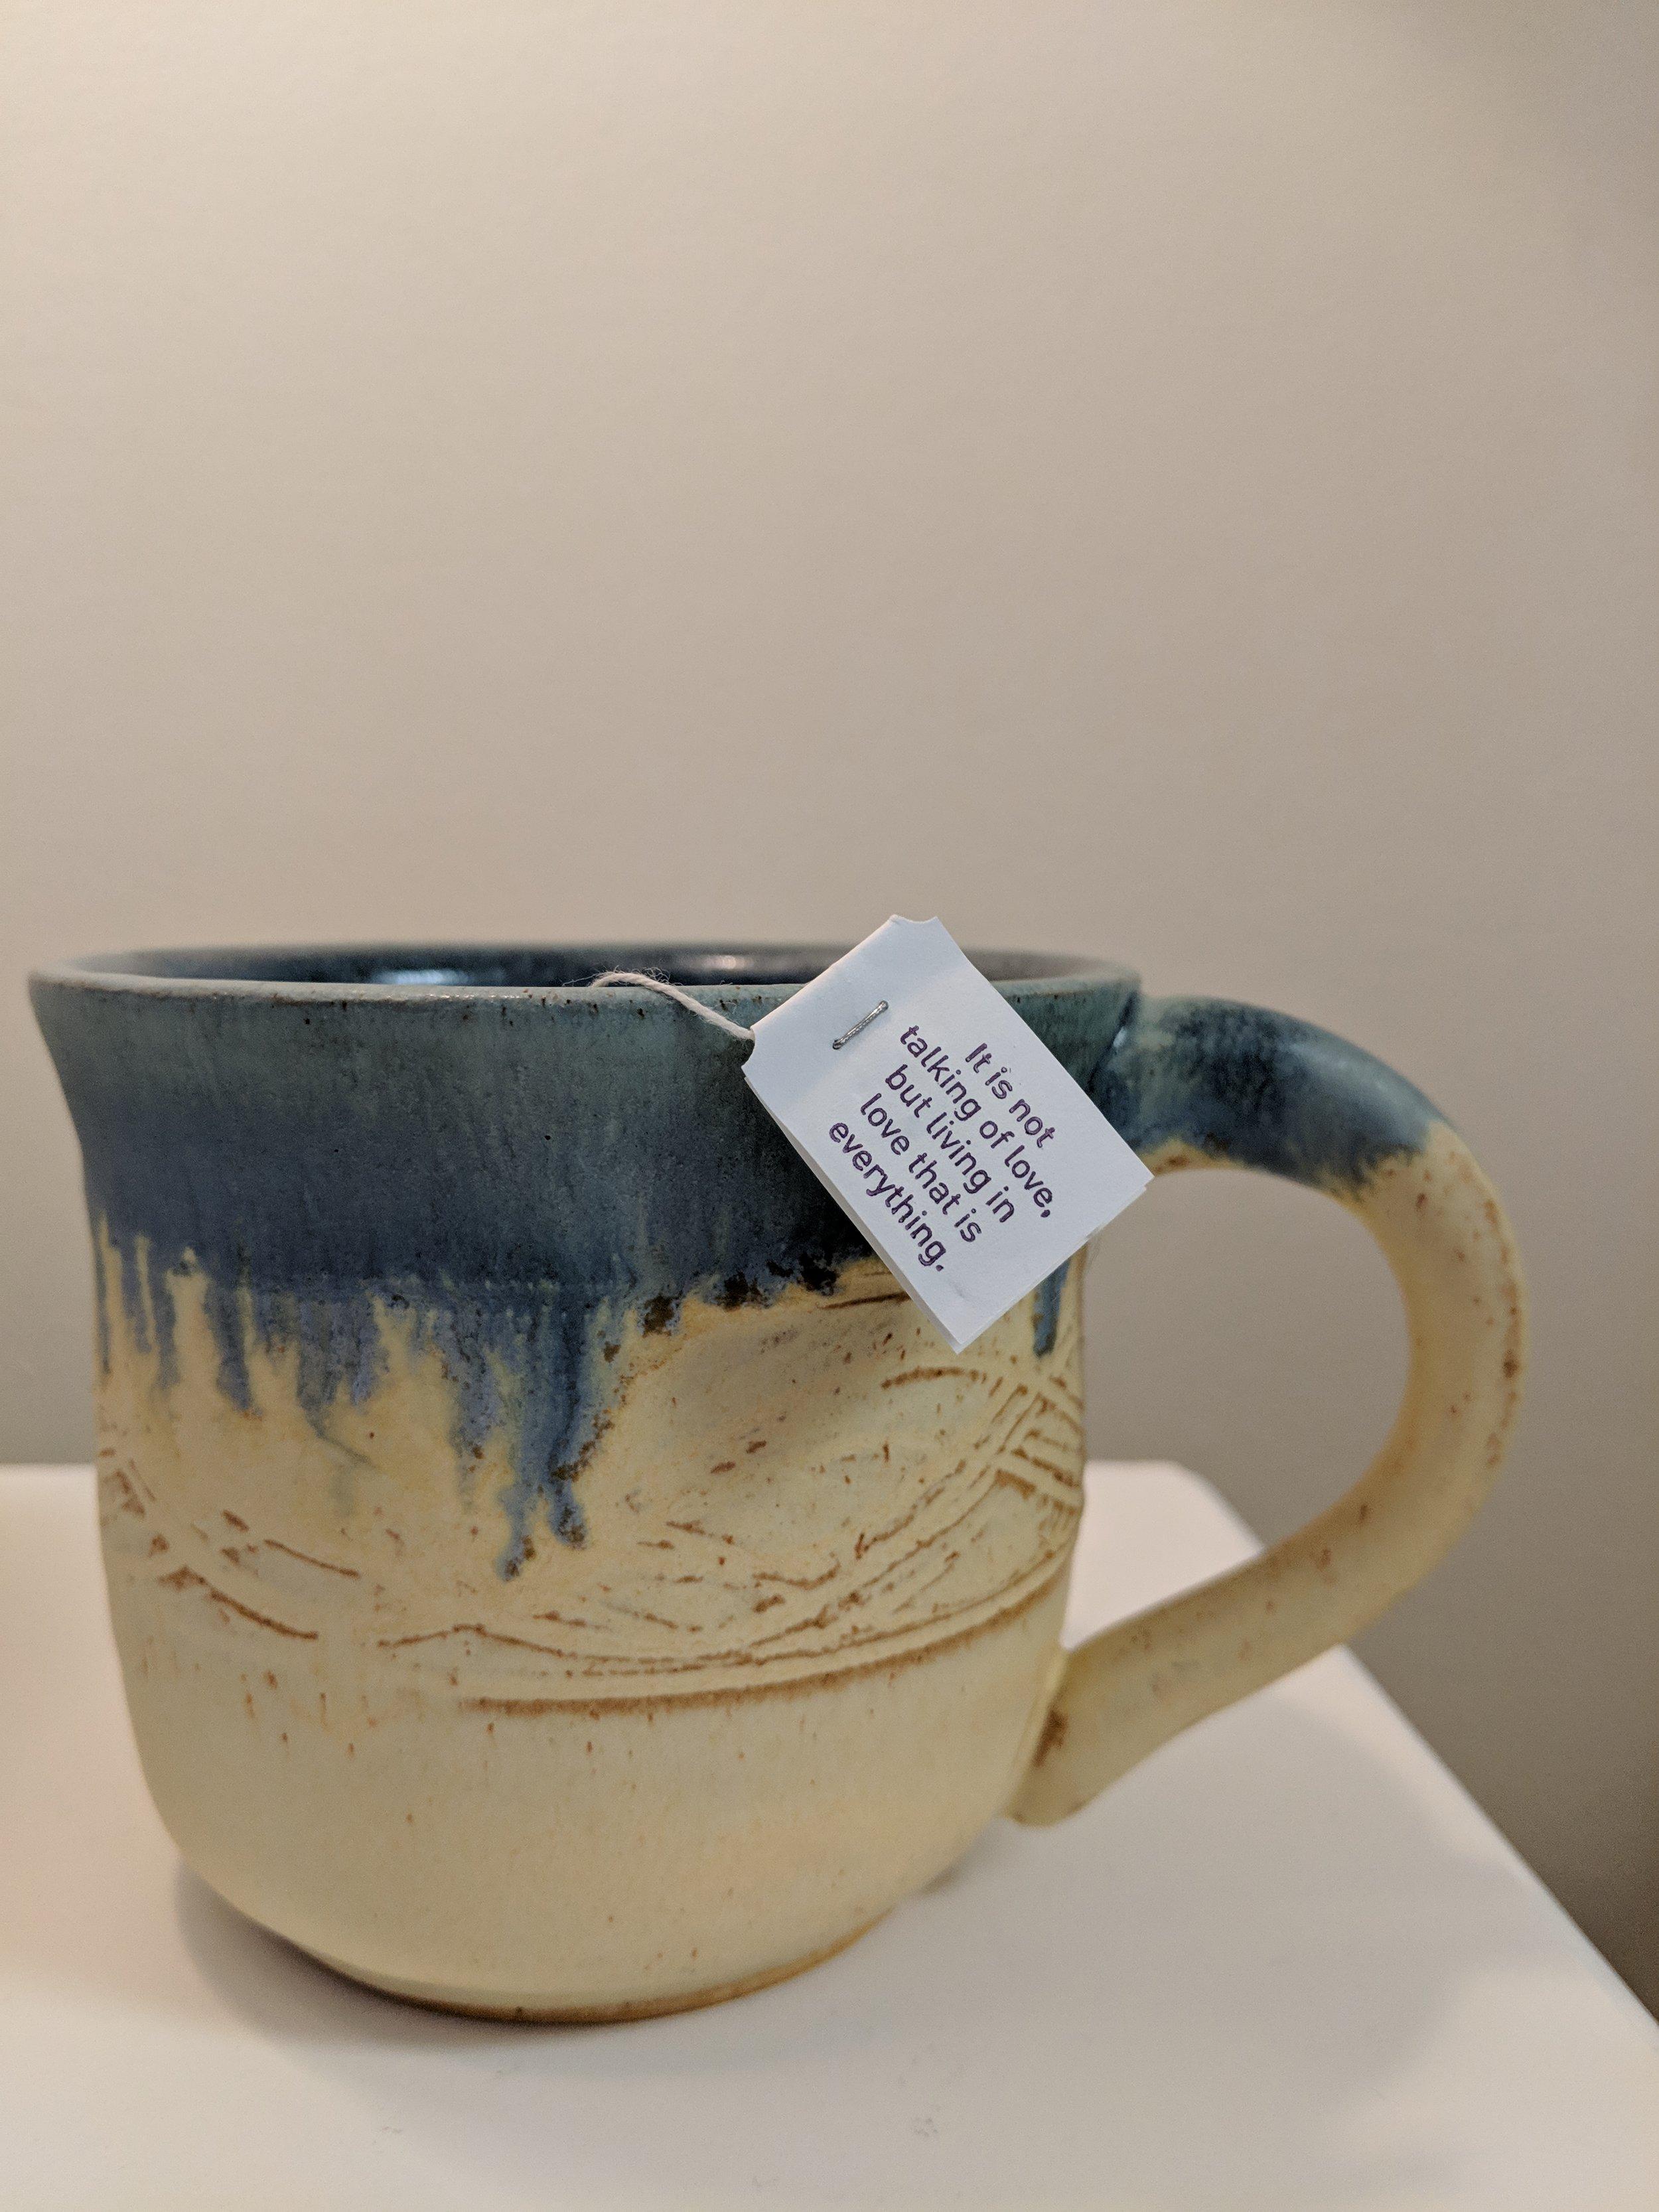 Our beautiful mugs by Susan Gelinas